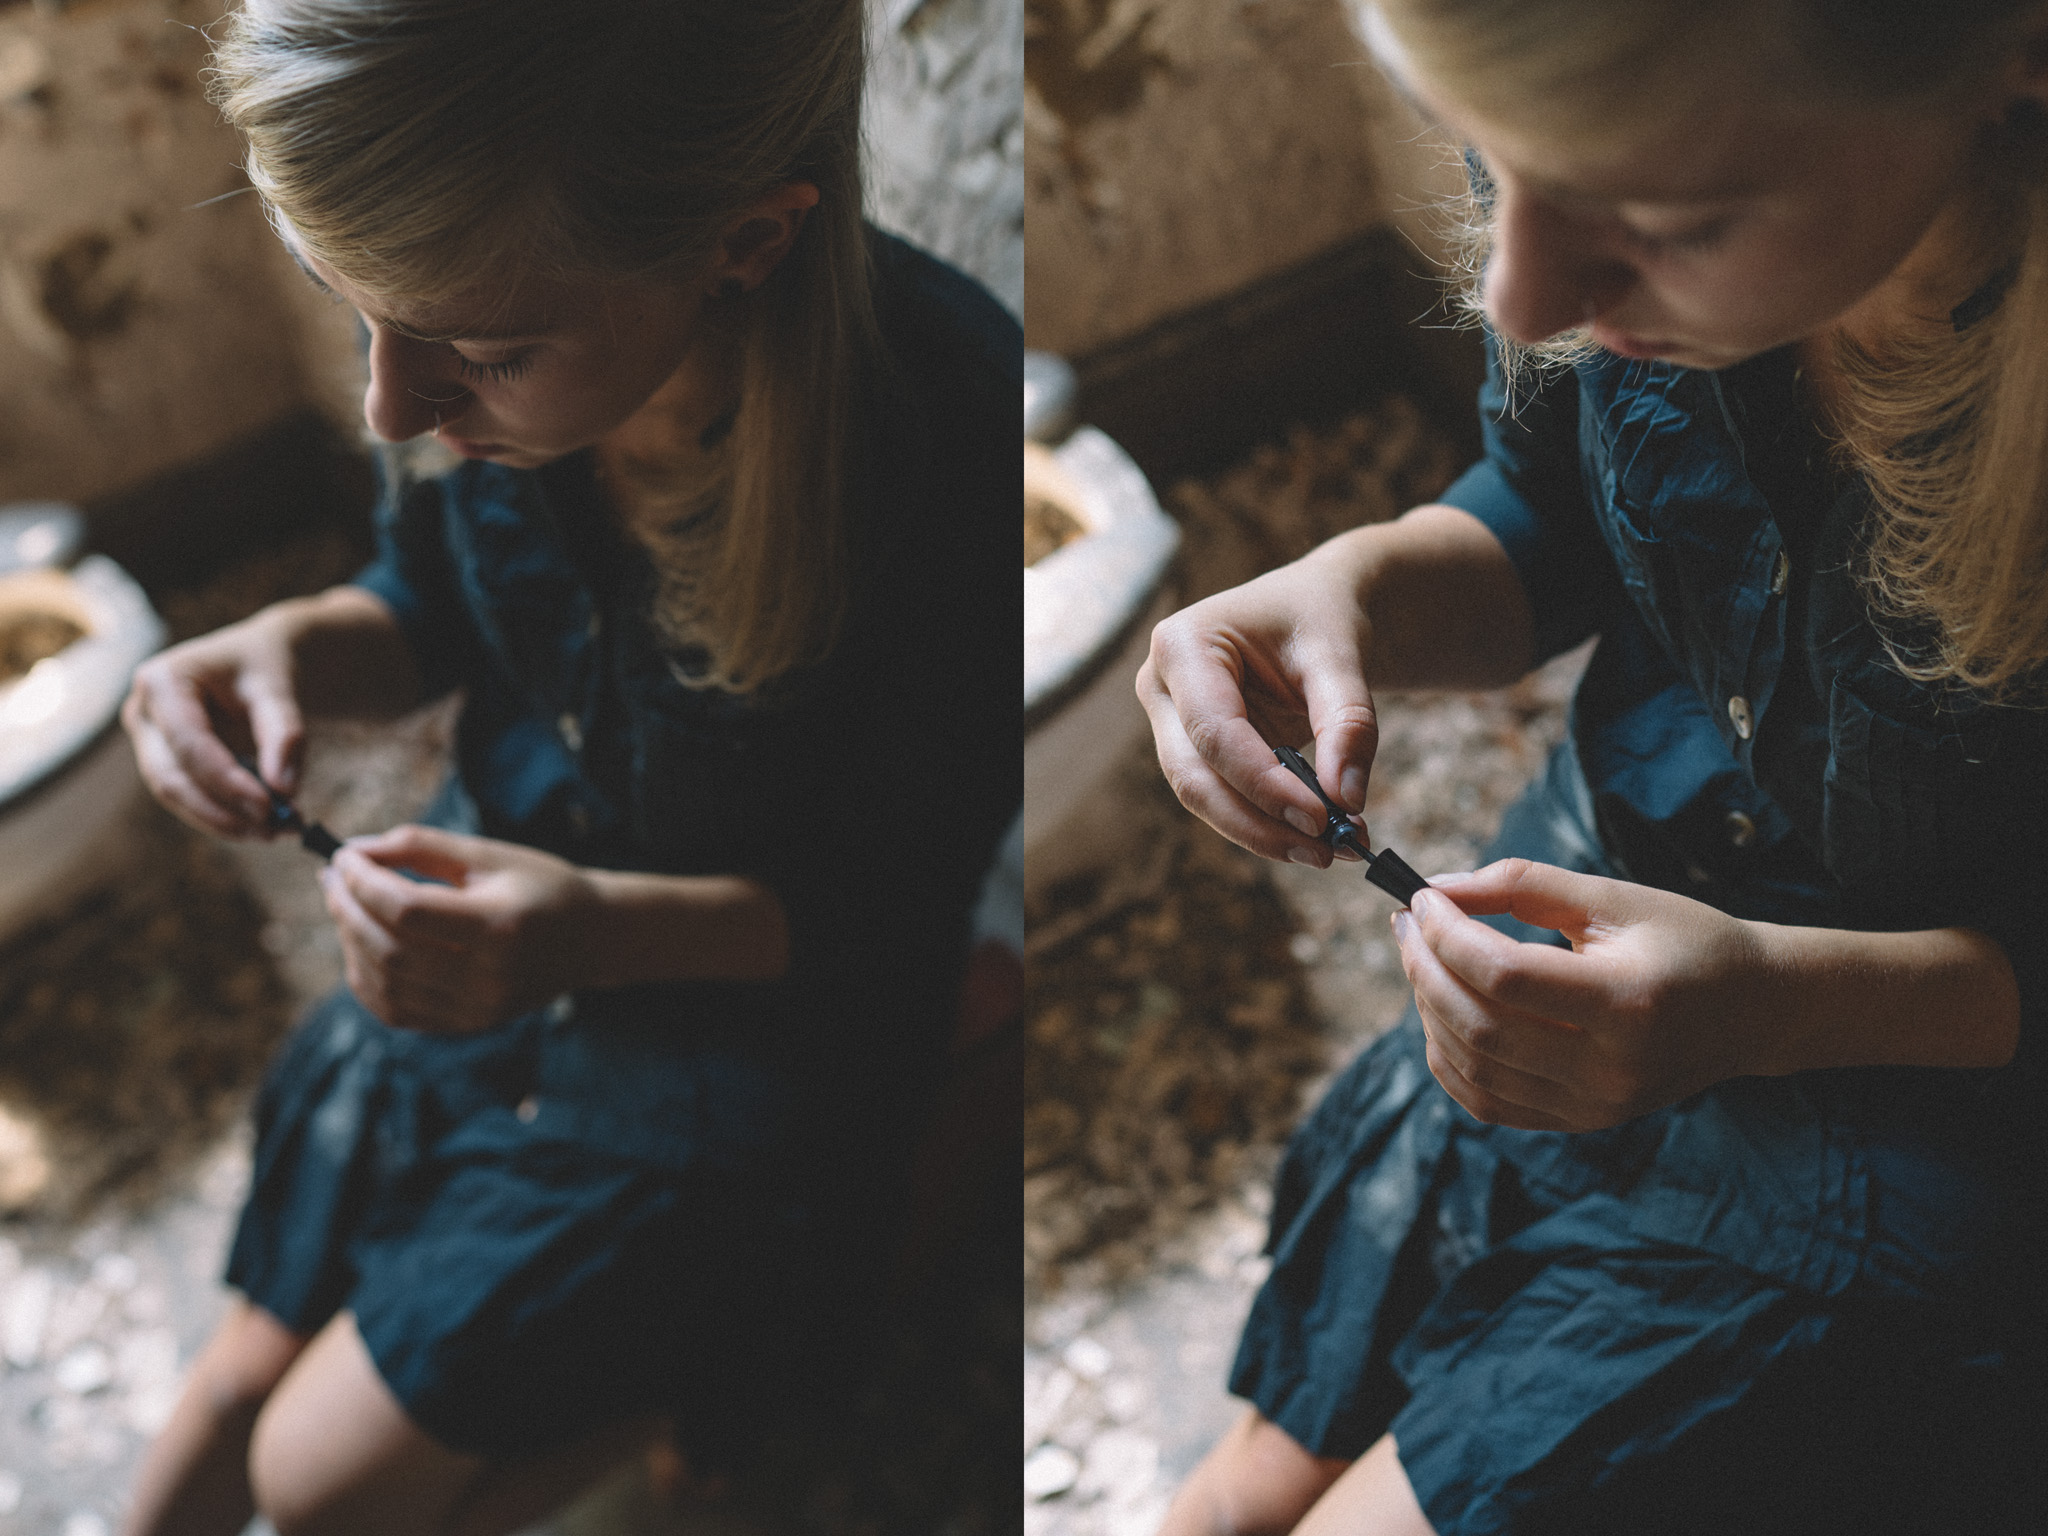 Model: Annie Patrick  Camera: Sony A7ii  Lens:Sony Distagon T* FE 35mm f/1.4 ZA